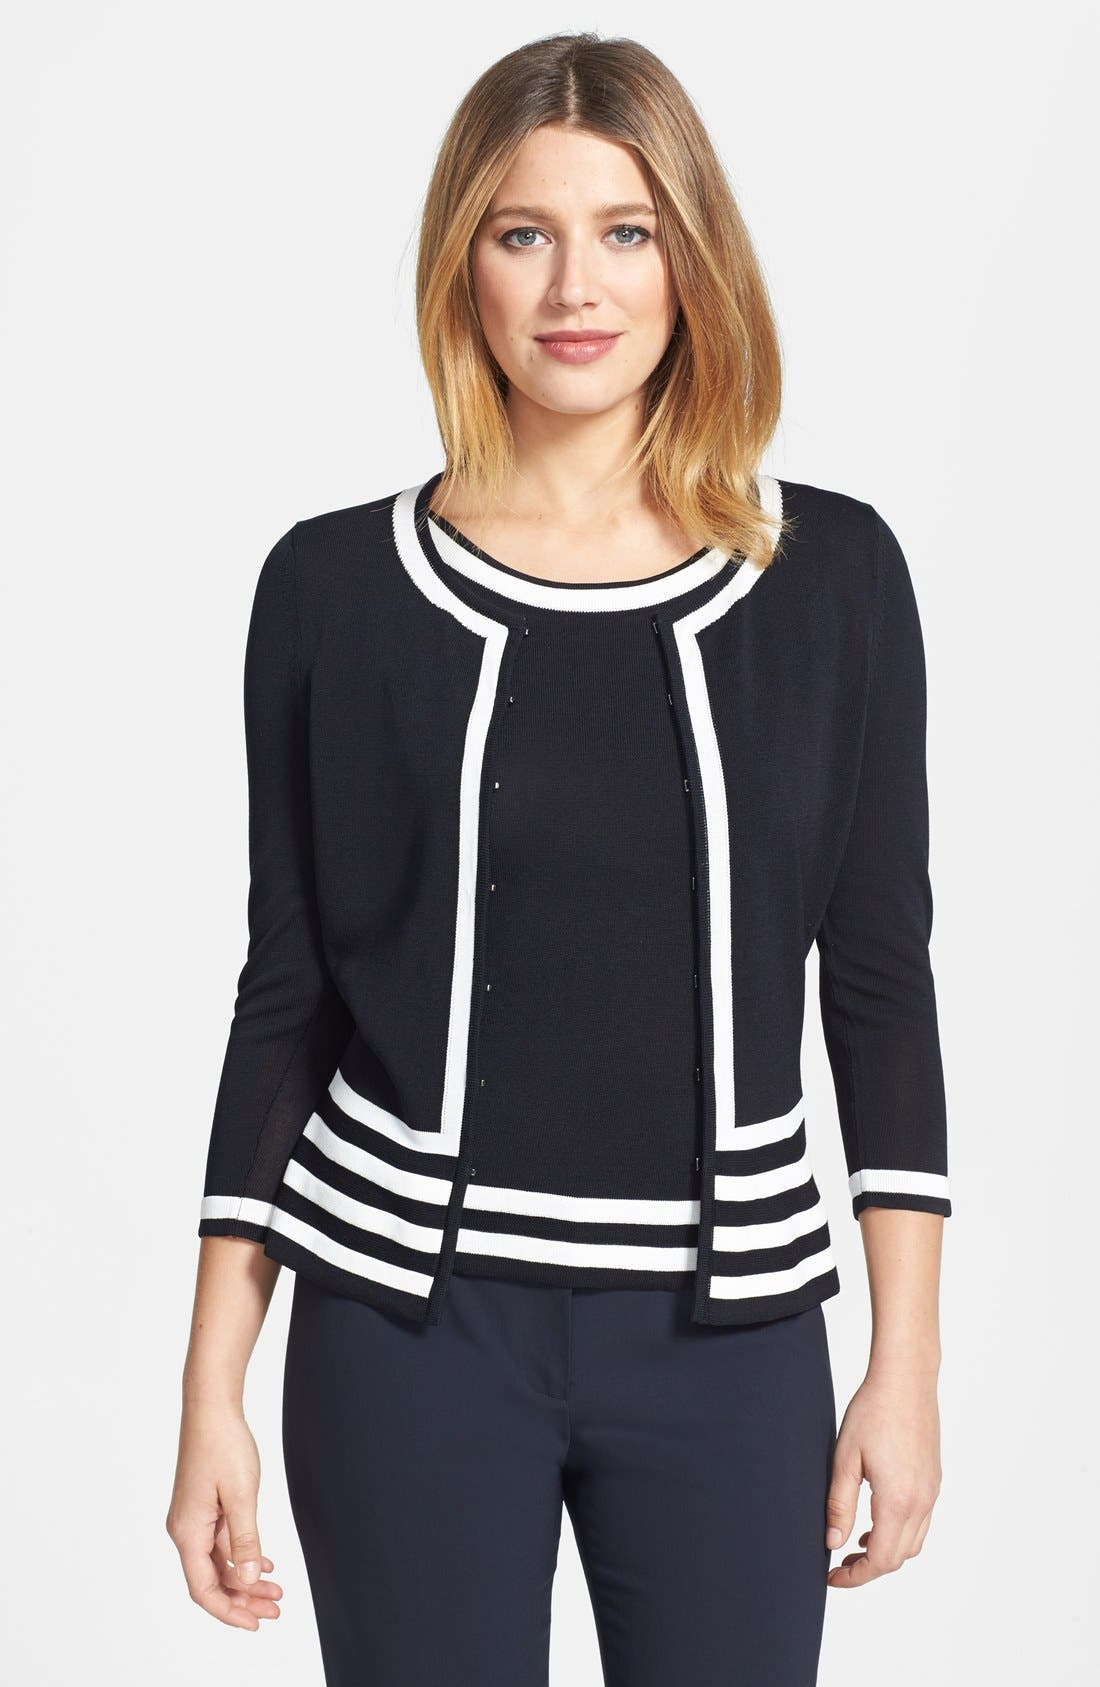 Alternate Image 1 Selected - BOSS Contrast Stripe Knit Cardigan